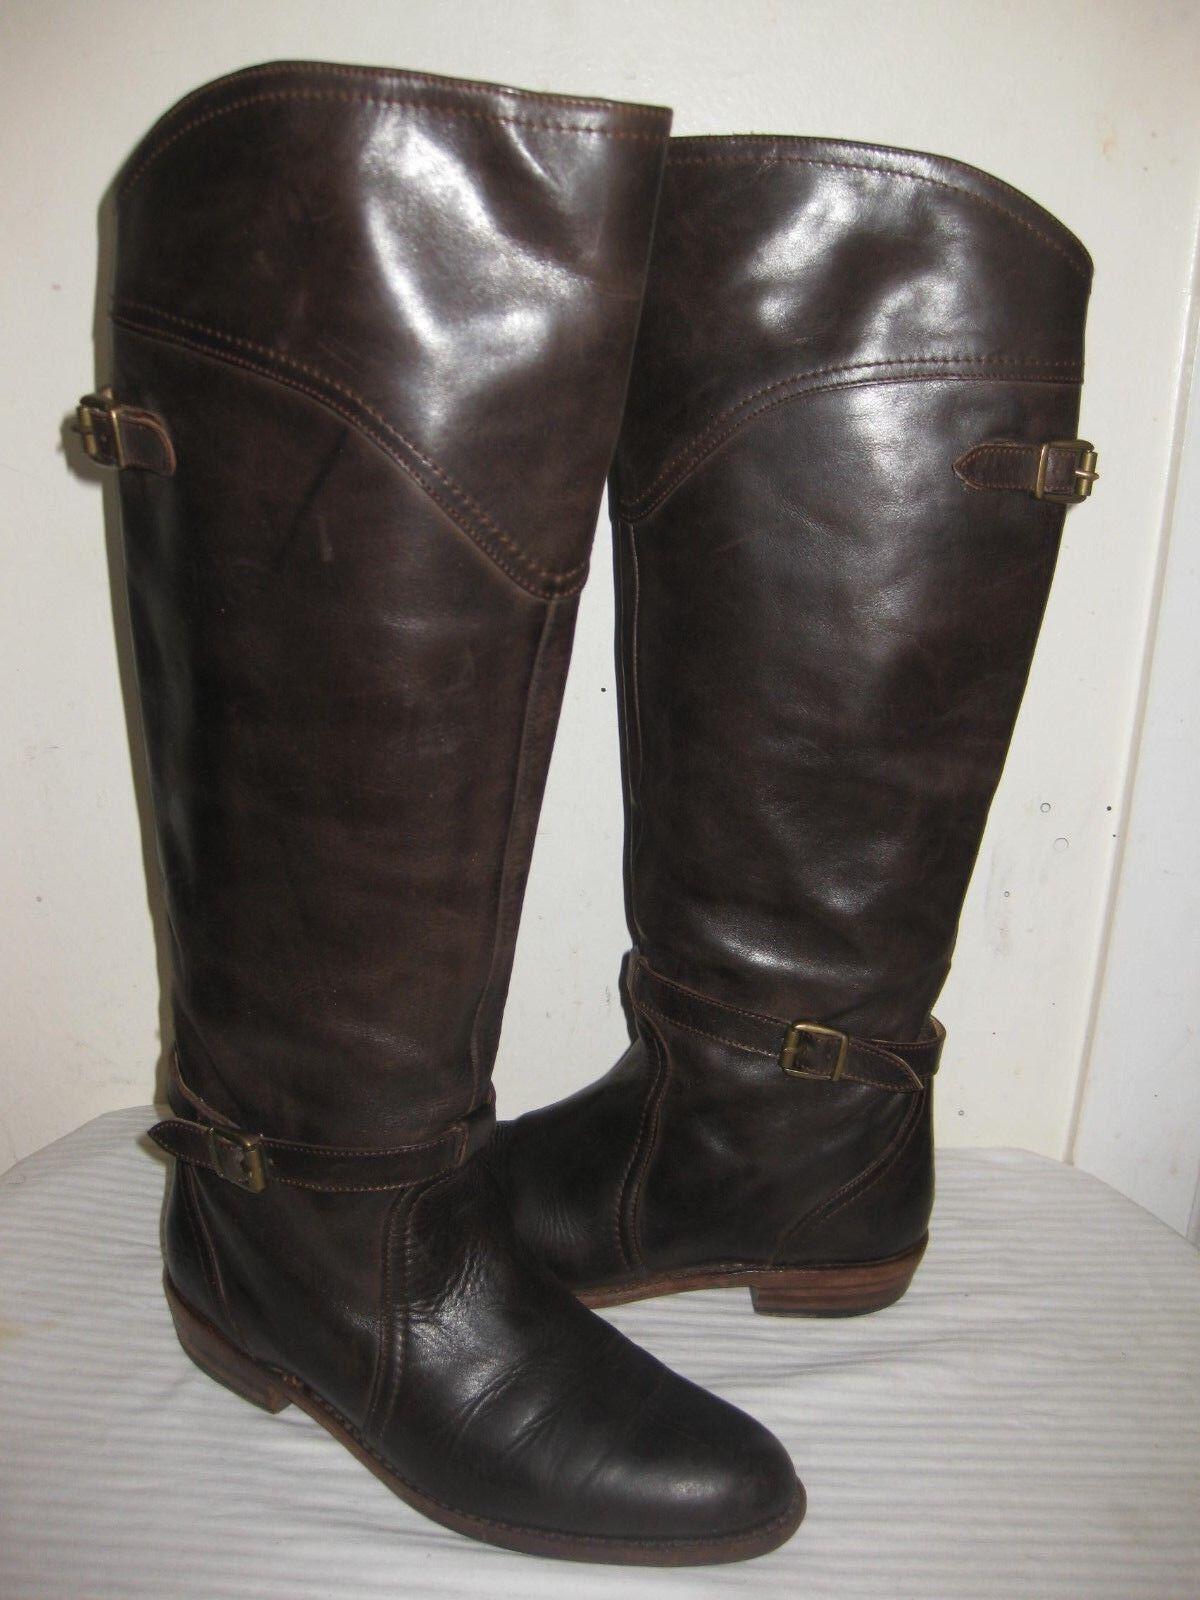 Frye Dorado  Women's Dark Brown Leather Riding Boots Shoes Women's  Size 7 dd70c6